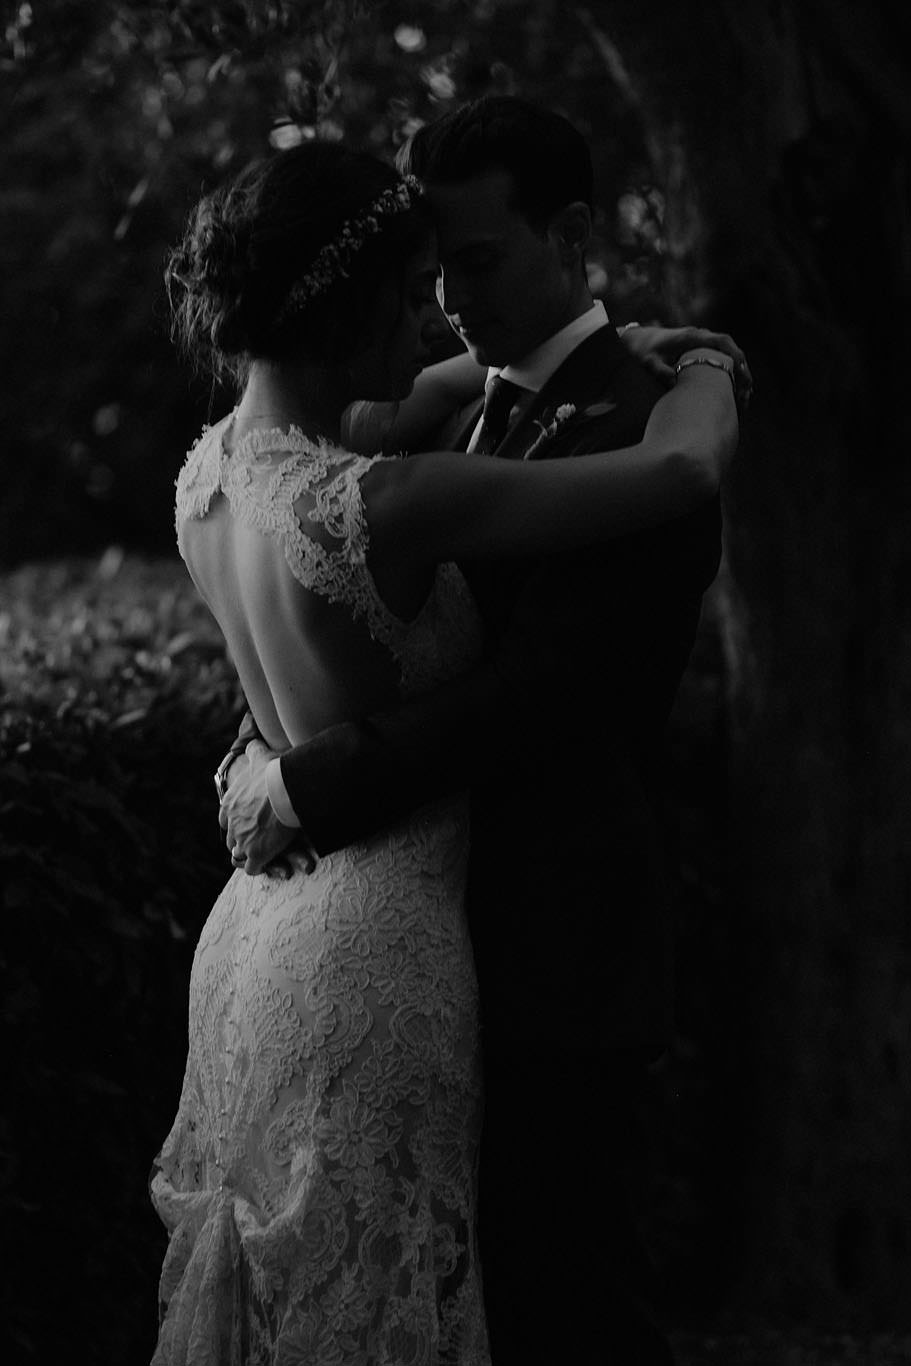 Max-Steph-Italy-Wedding-633.jpg